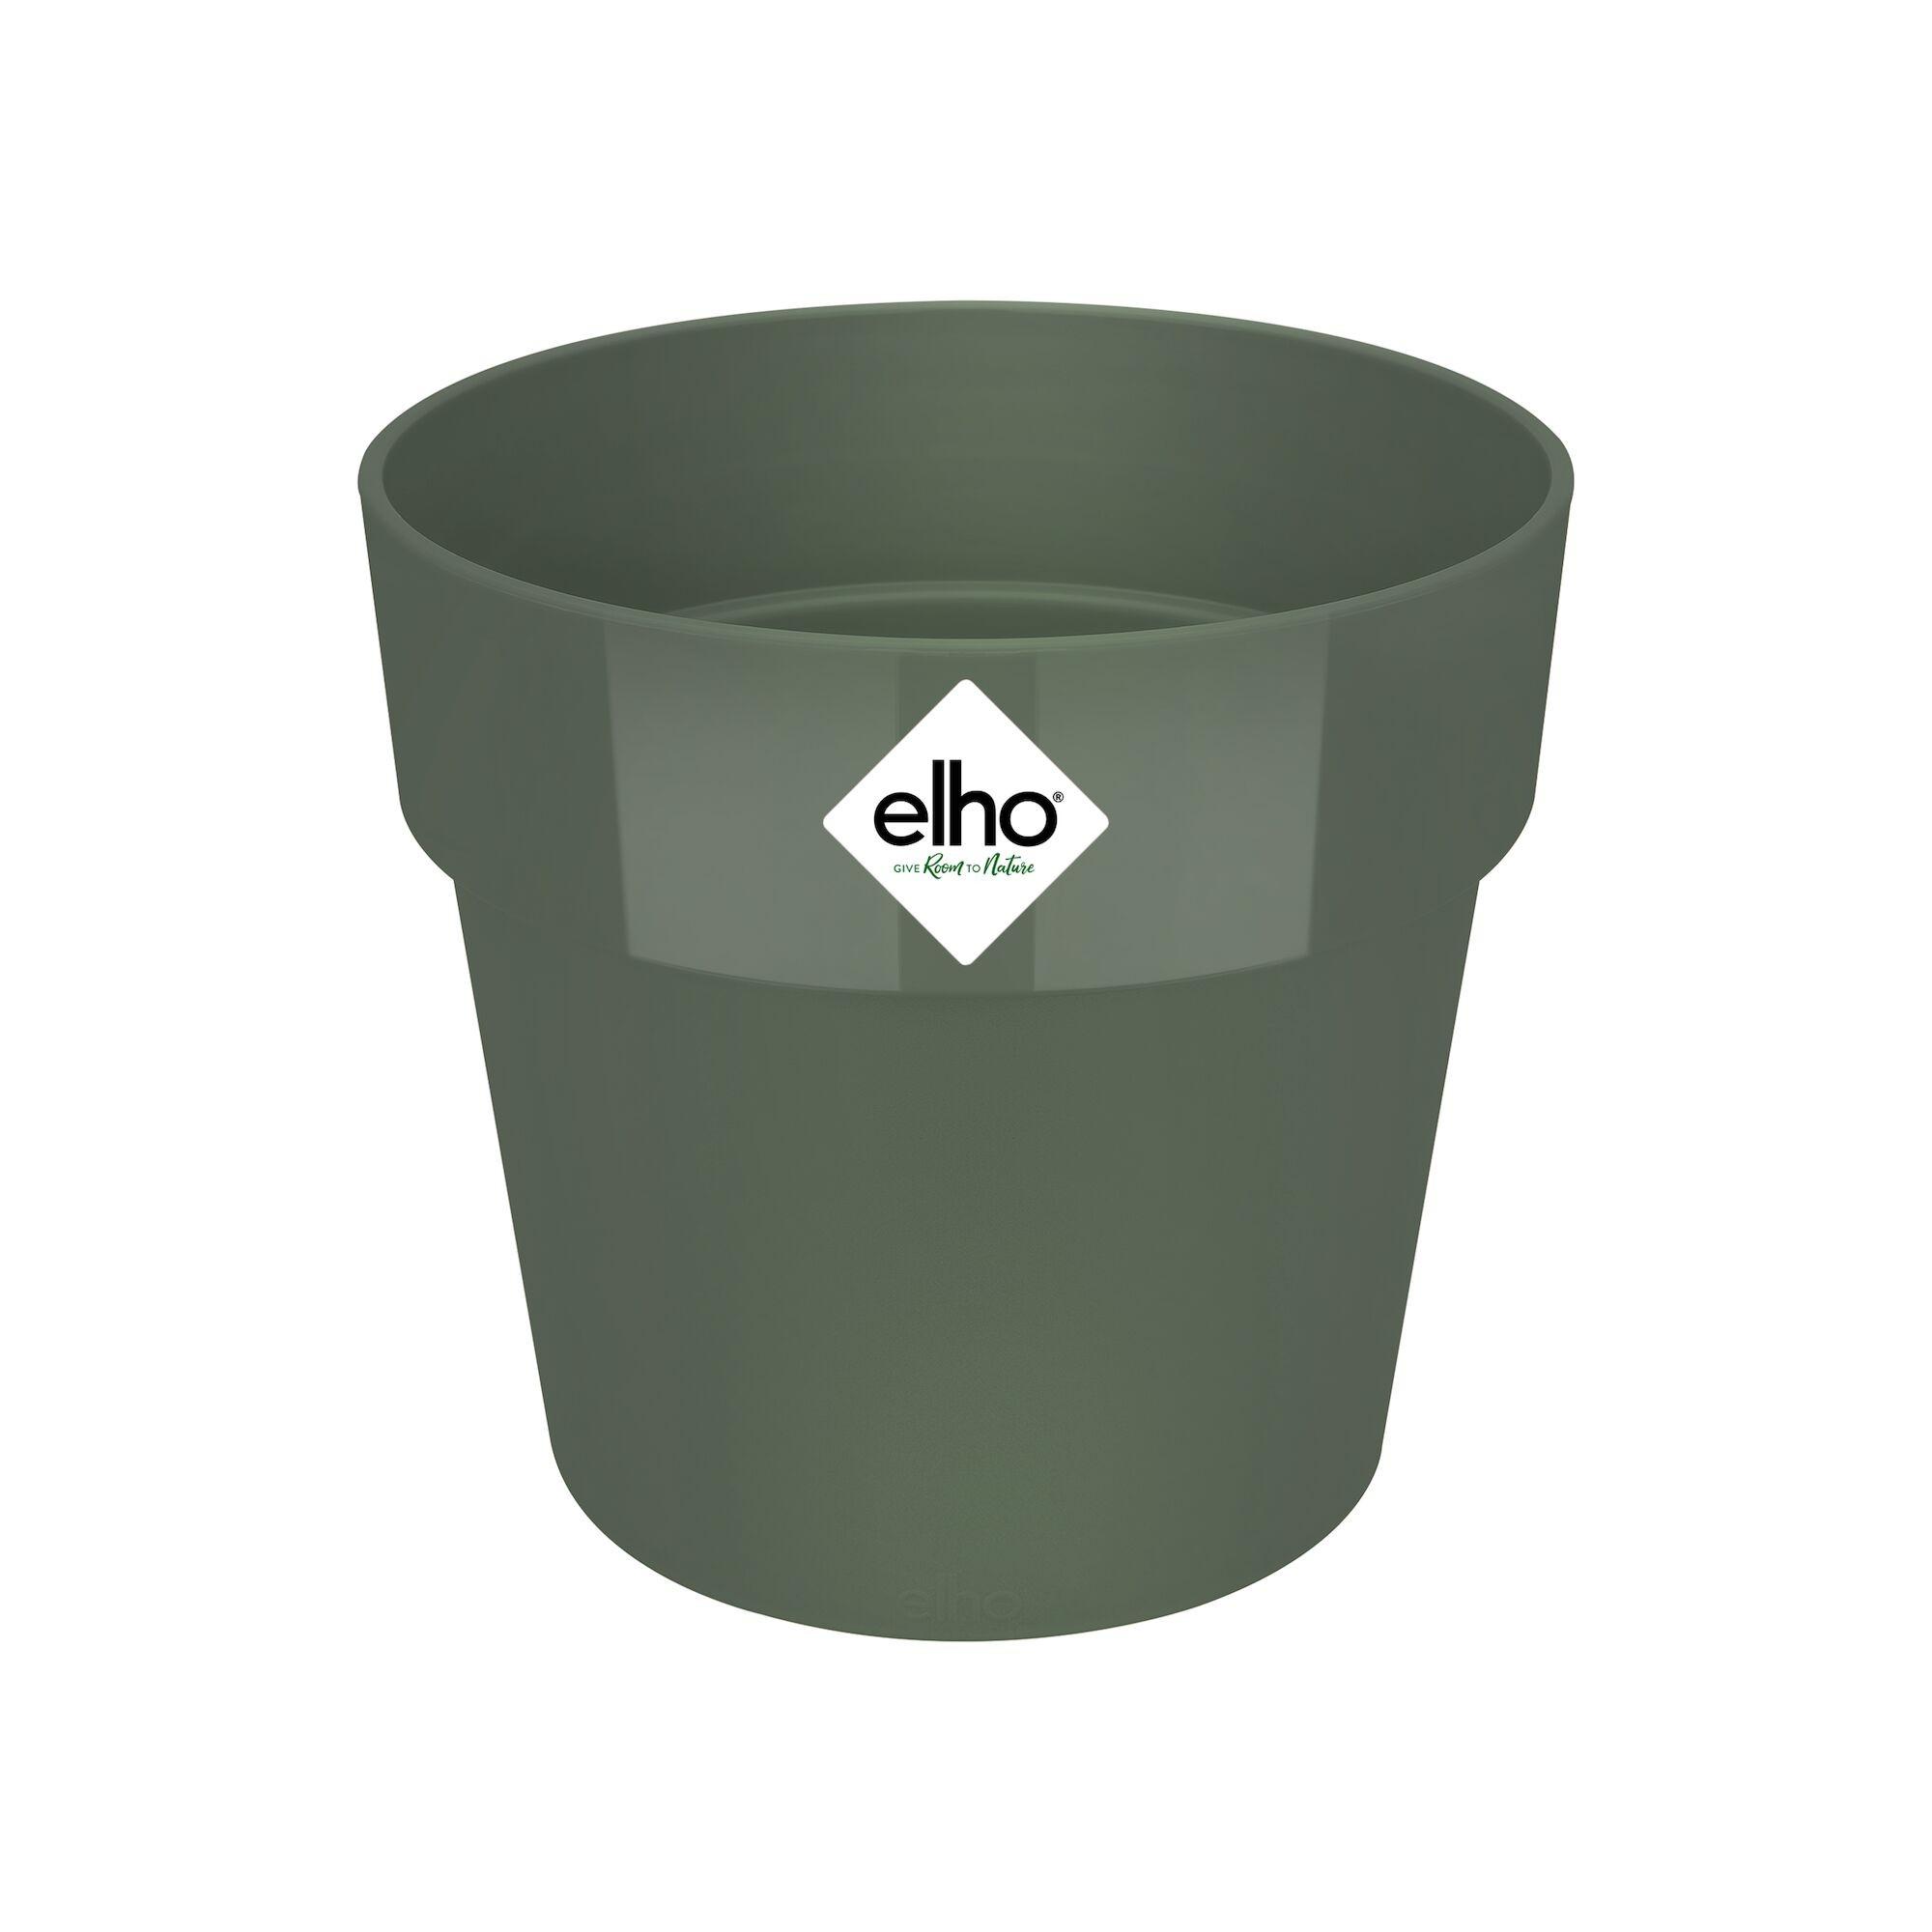 B.for original round mini 7 leaf green